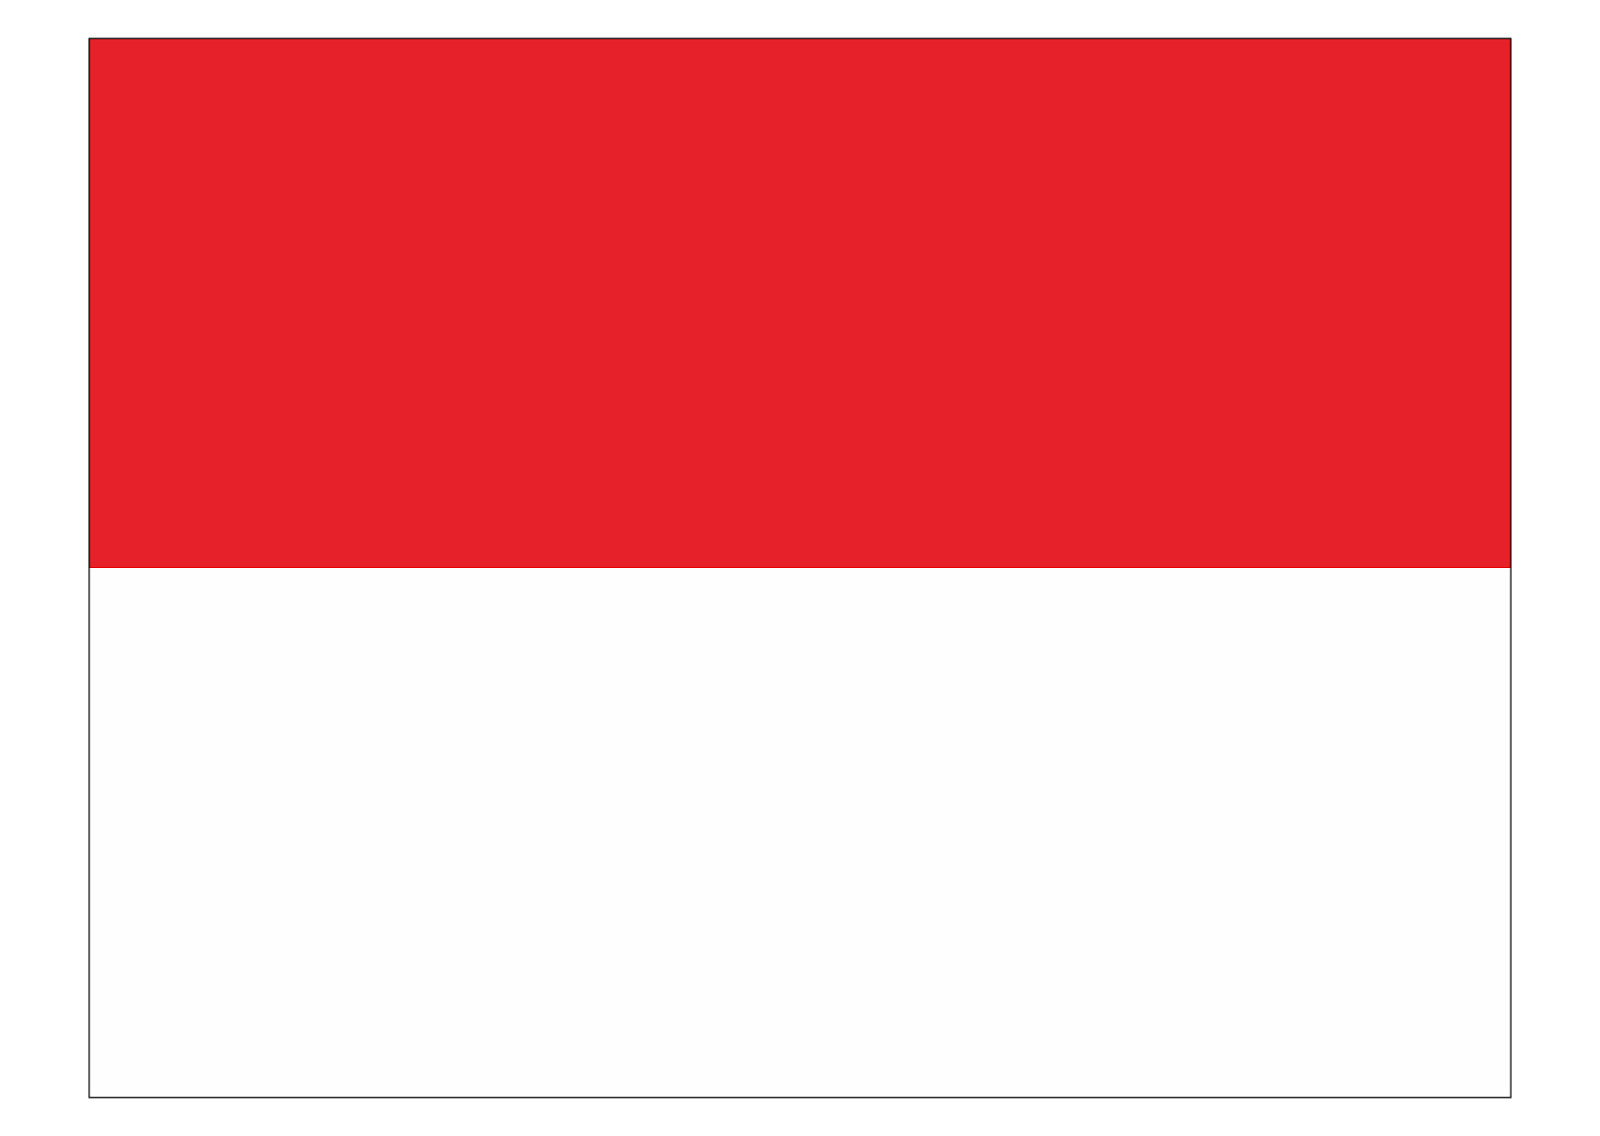 bendera indonesia png yahoo image search results bendera monako indonesia bendera indonesia png yahoo image